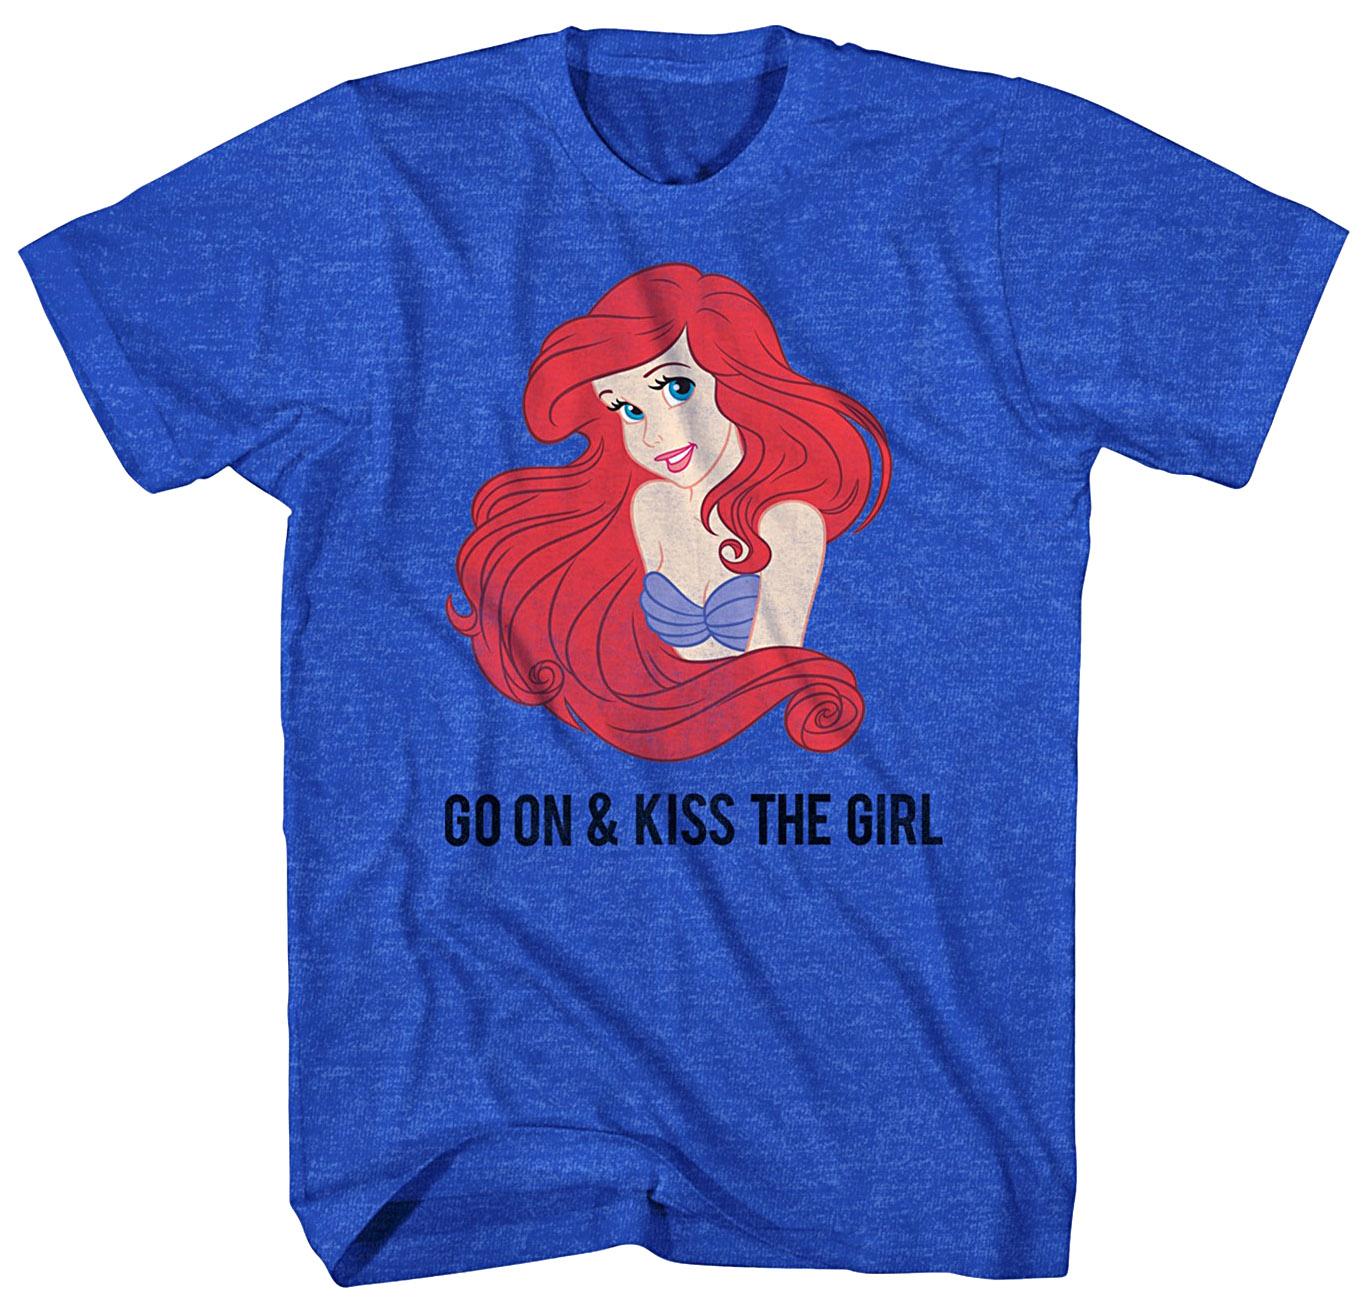 Disney Little Mermaid Go On & Kiss The Girl Graphic T-shirt